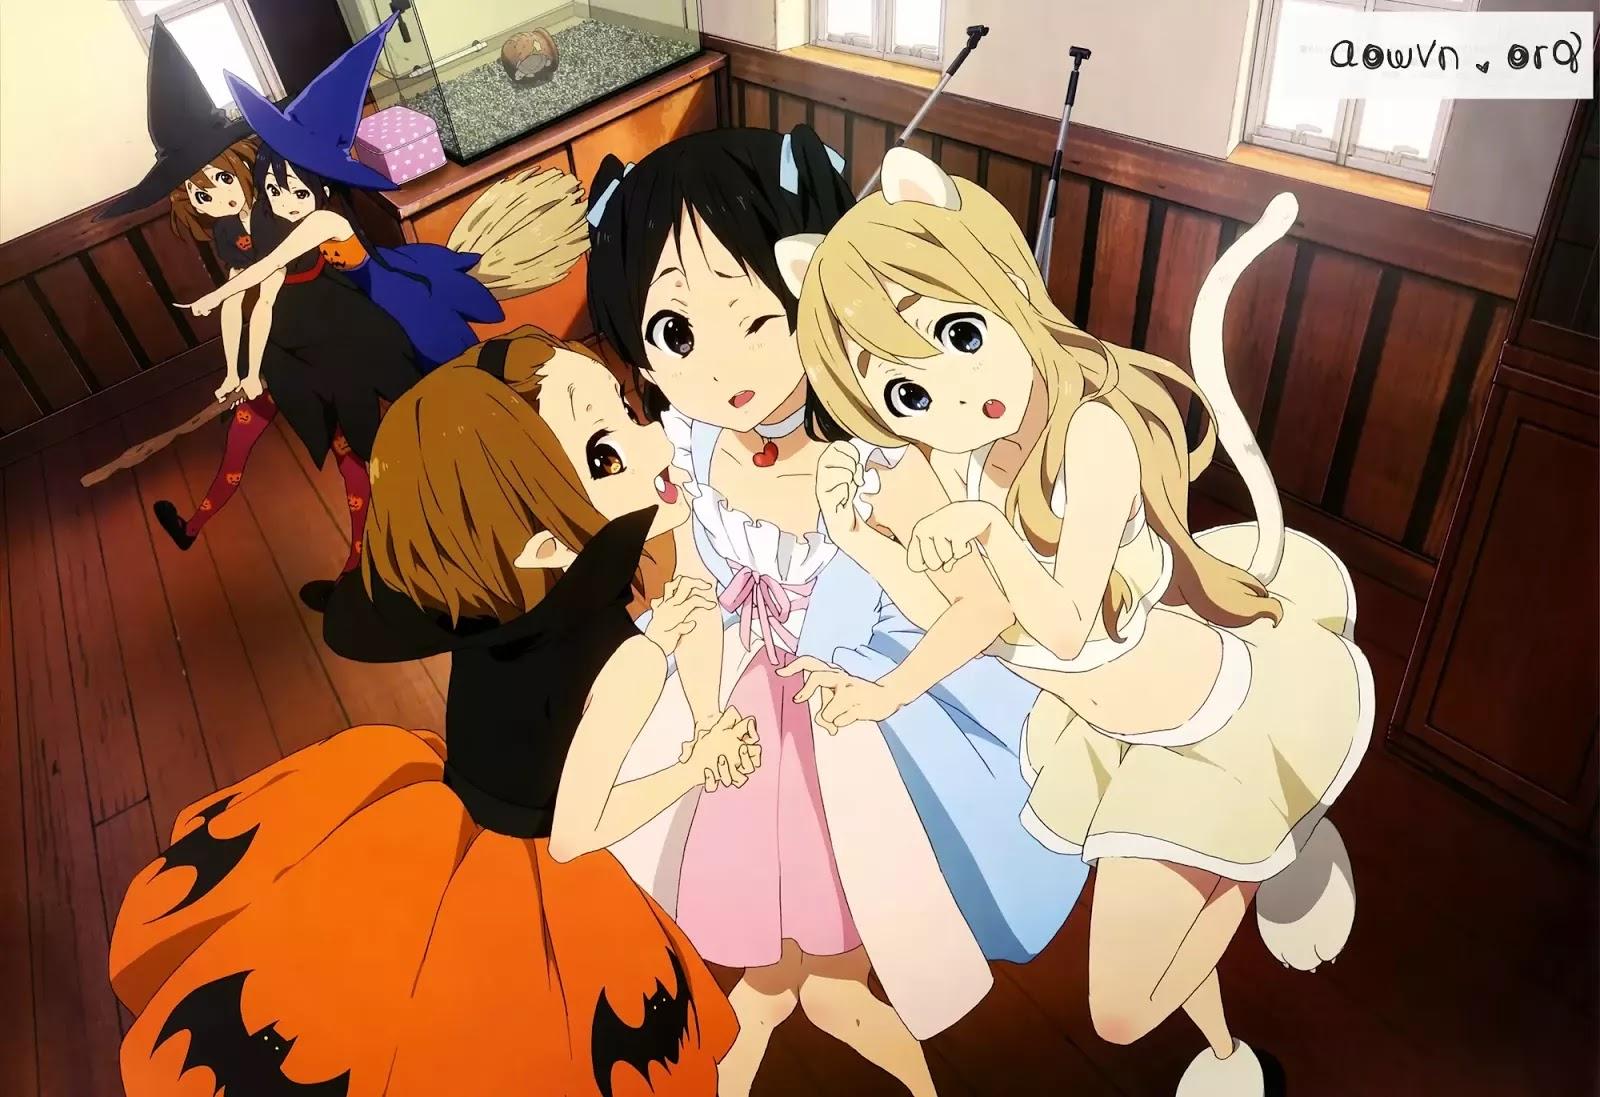 k on amv - #13 Pay Phone - minisaku25 AMV | Anime Music Video